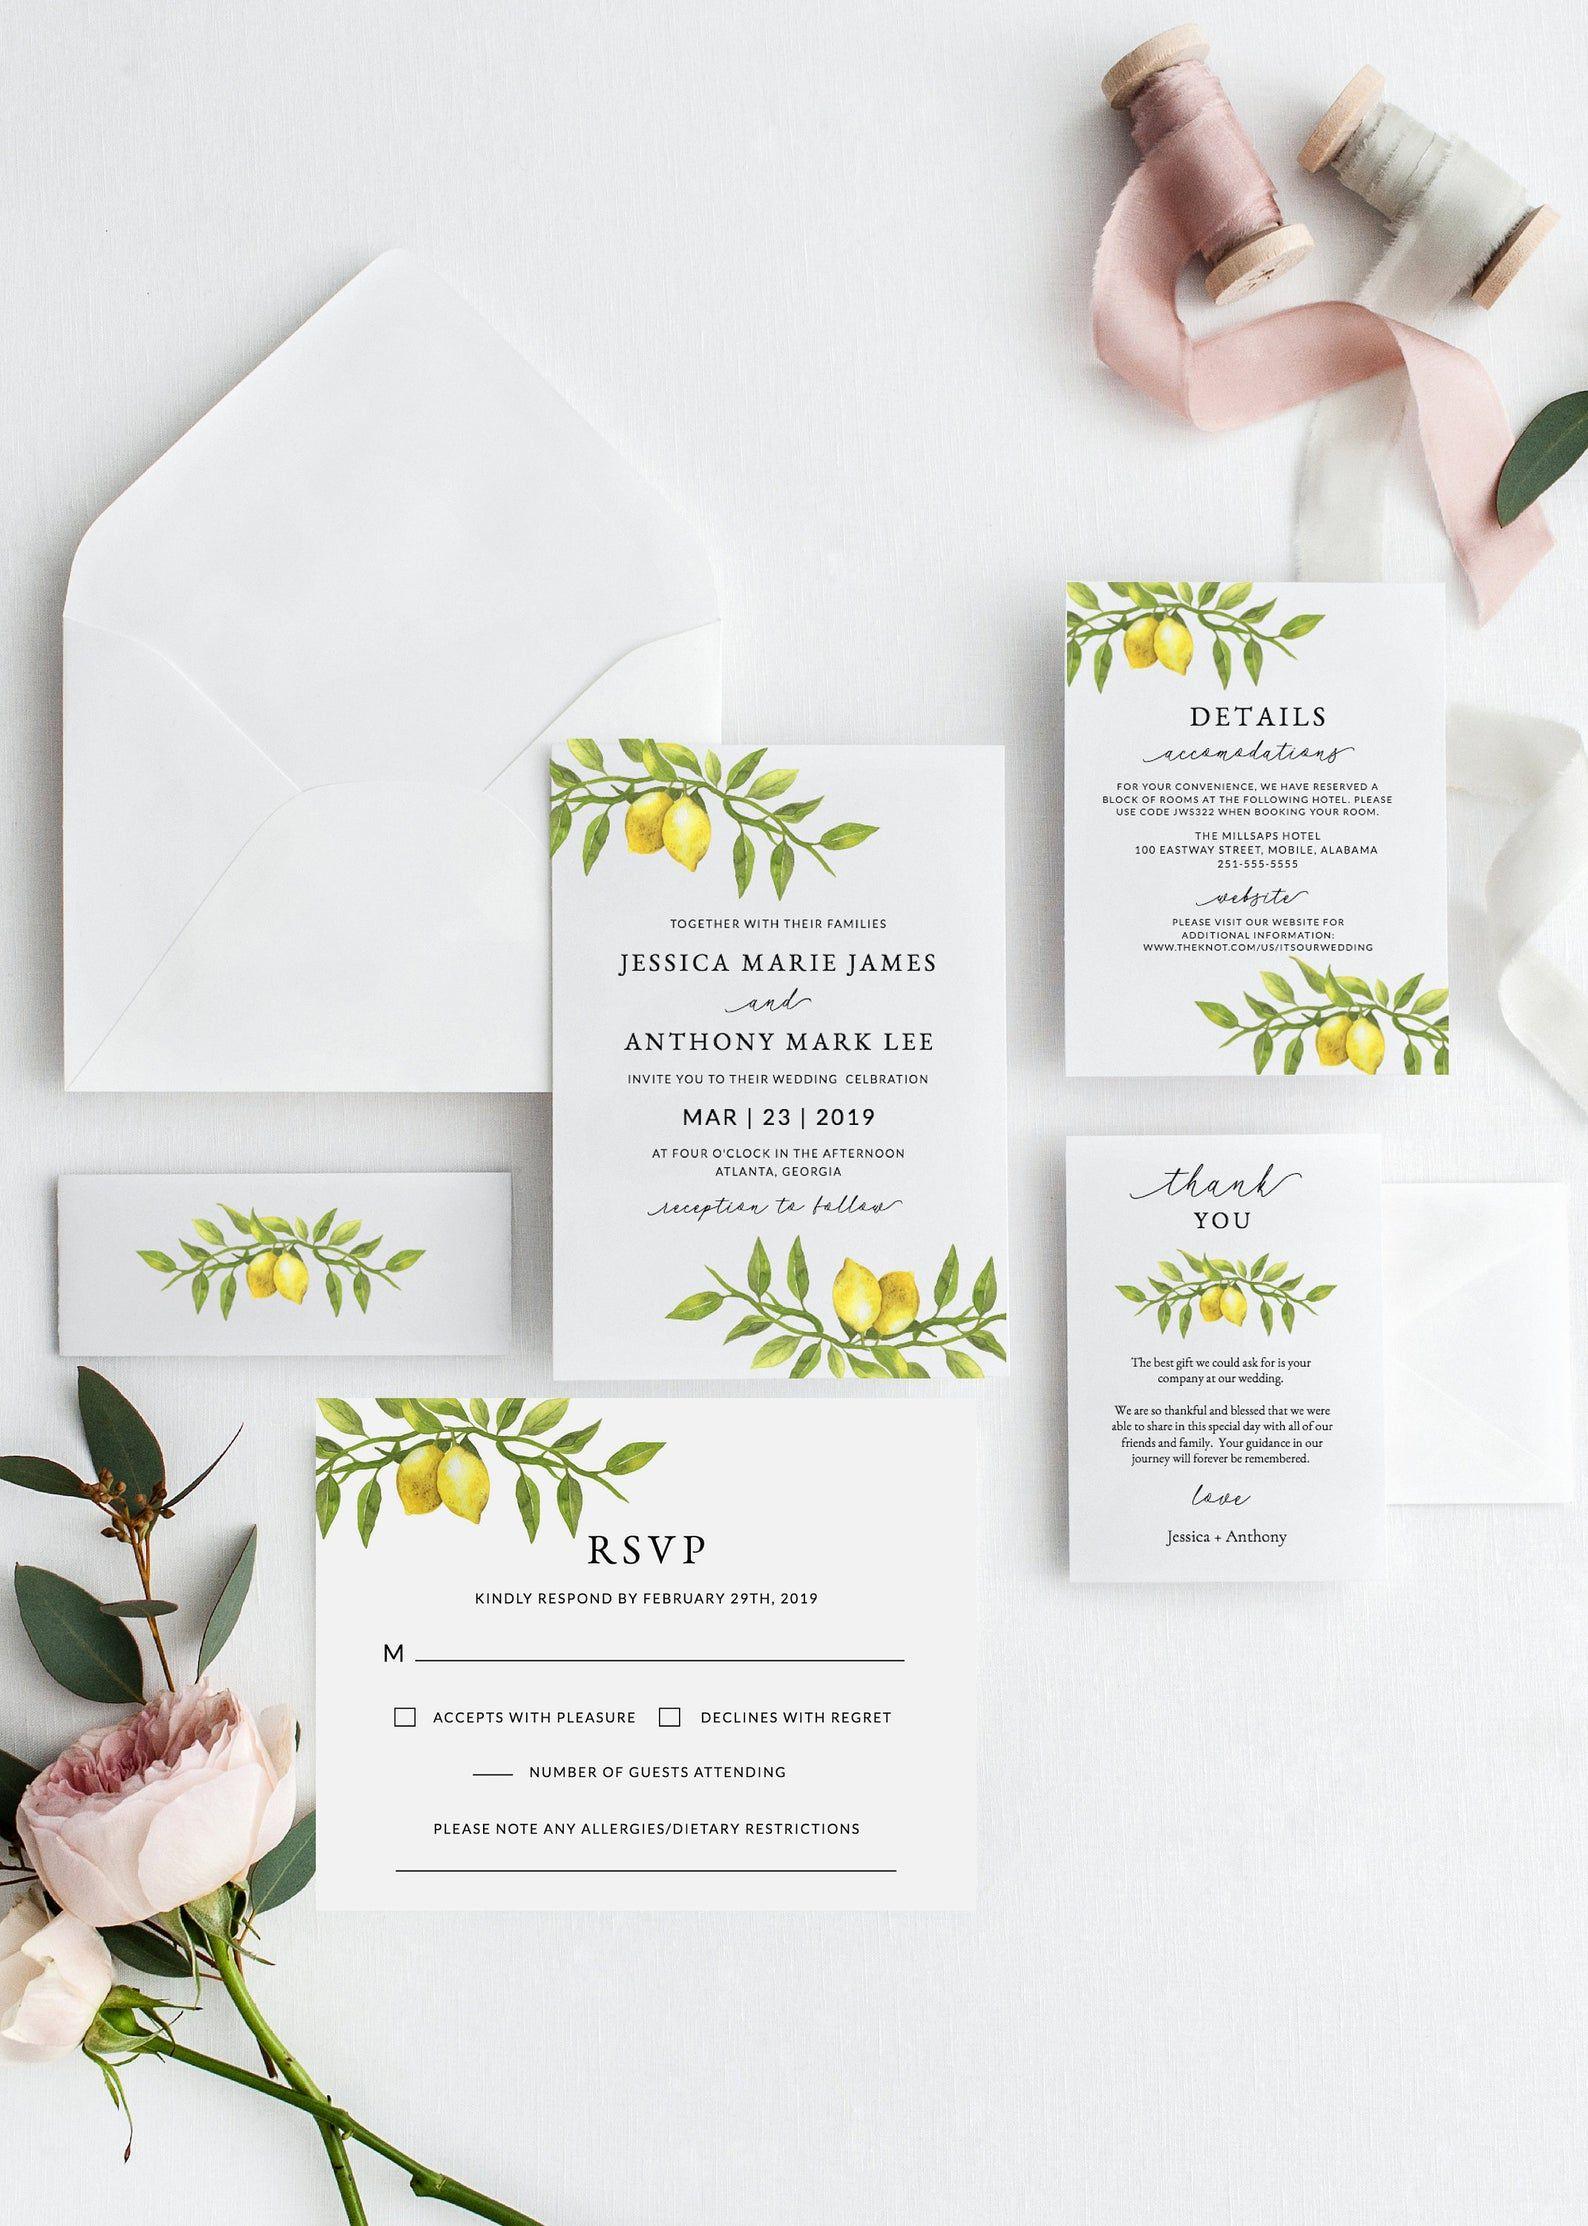 Lemon Wedding Invitation Template Download Printable Etsy Lemon Wedding Invitations Wedding Invitation Templates Wedding Invitations